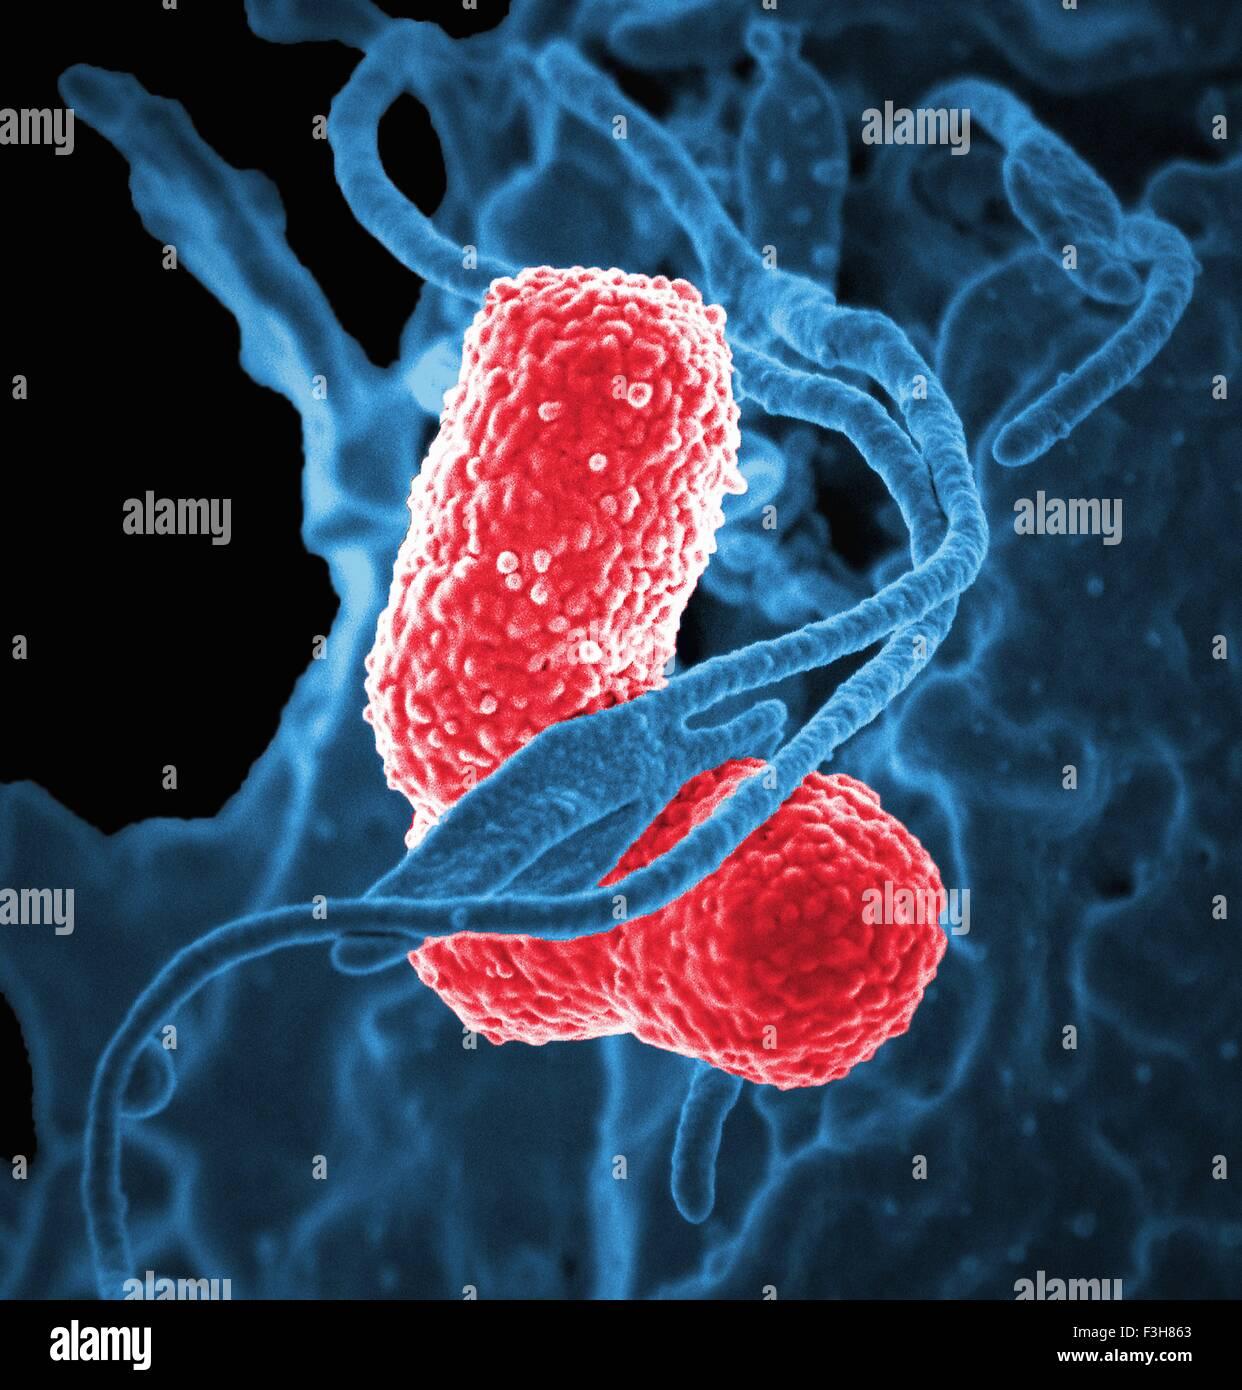 SEM white blood cell Klebsiella bacteria - Stock Image